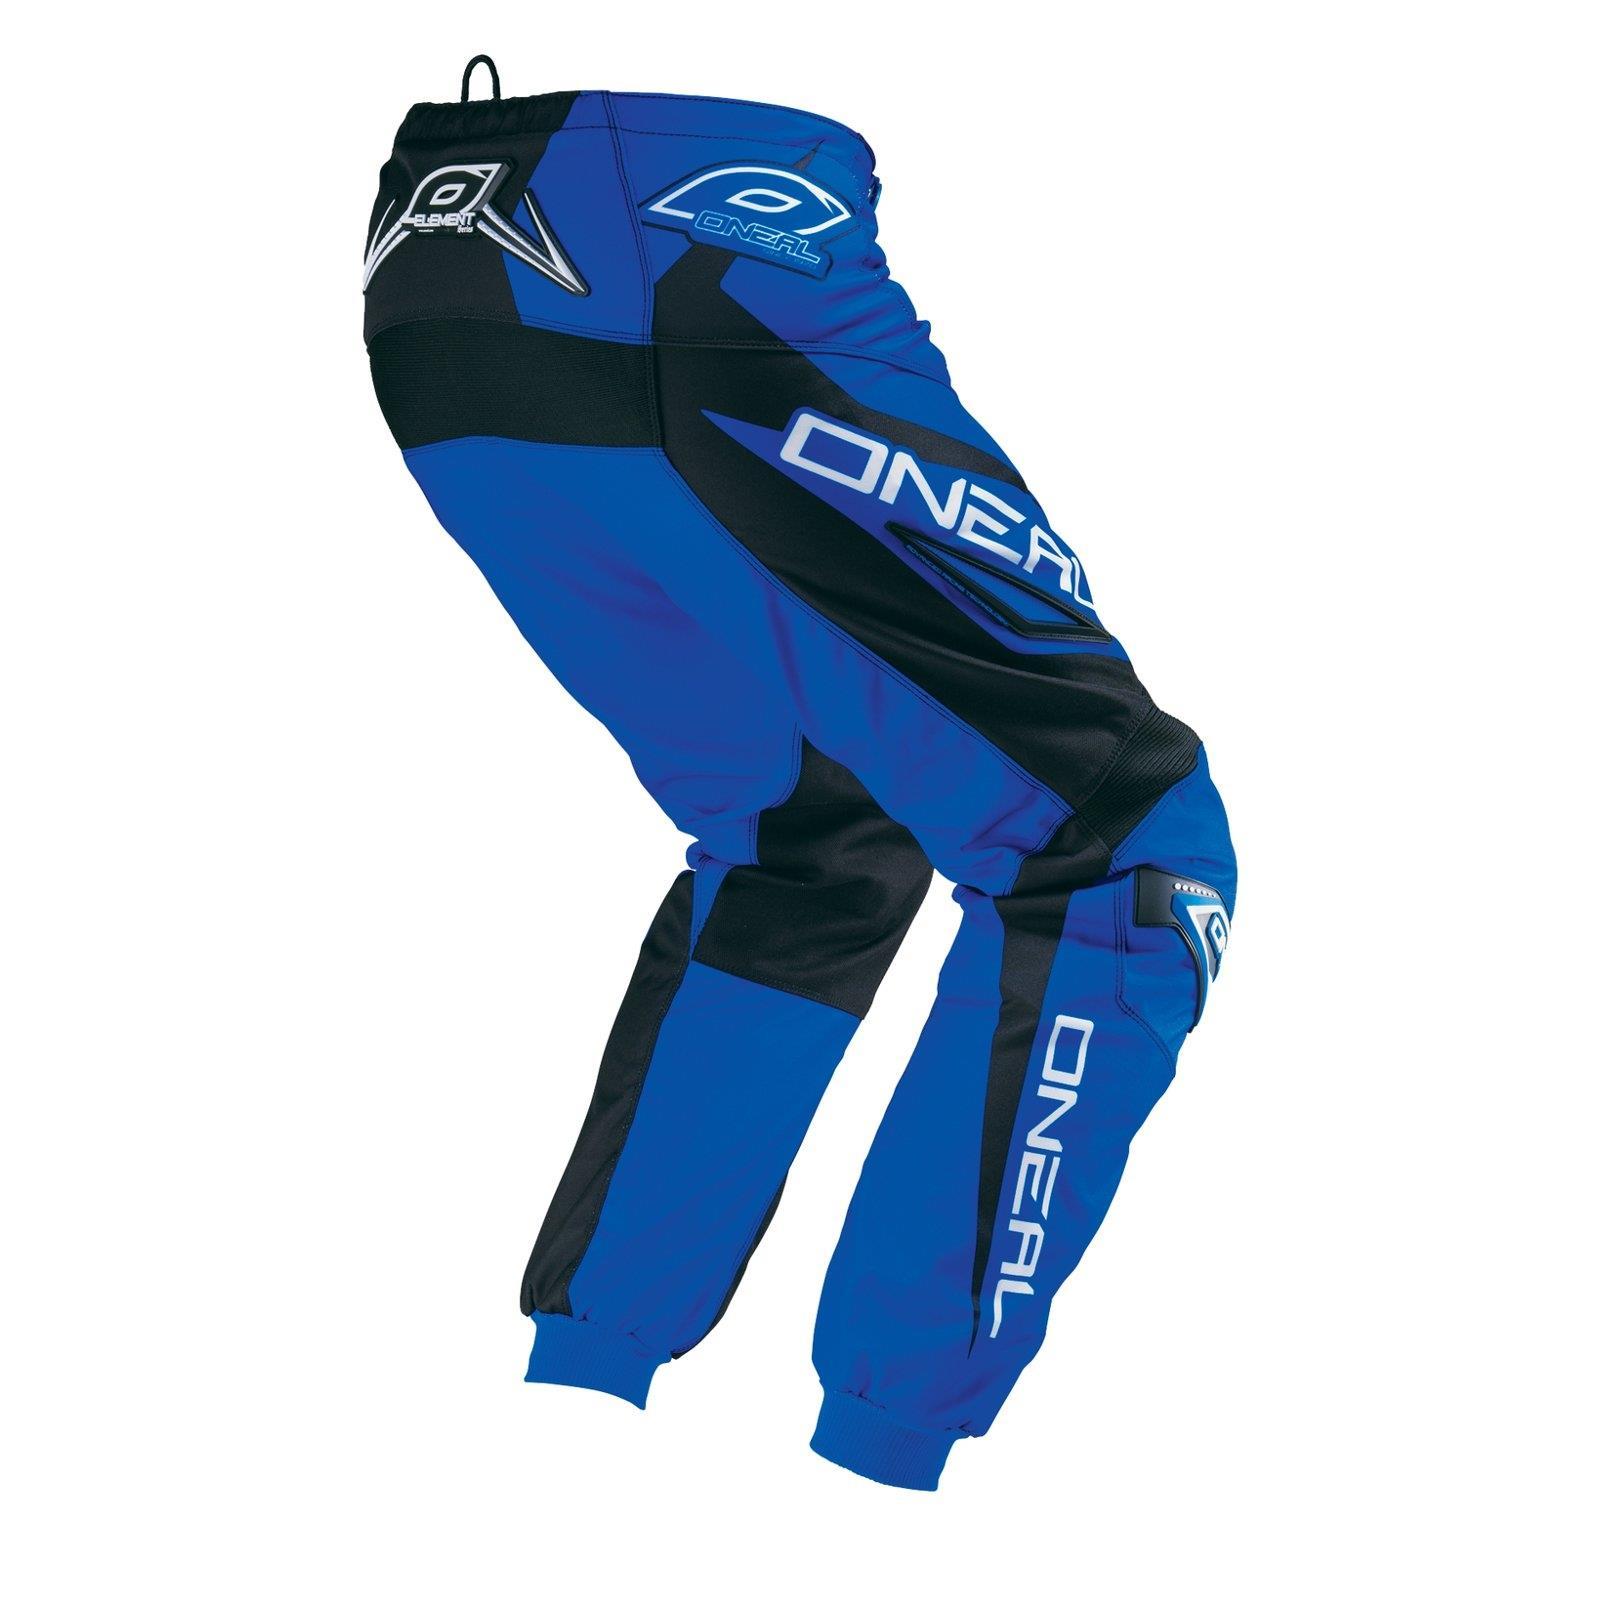 ONeal-pantalones-de-Jersey-de-los-ninos-de-pantalones-cortos-ninos-MX-bicicleta-DH-montana-bicicleta miniatura 54